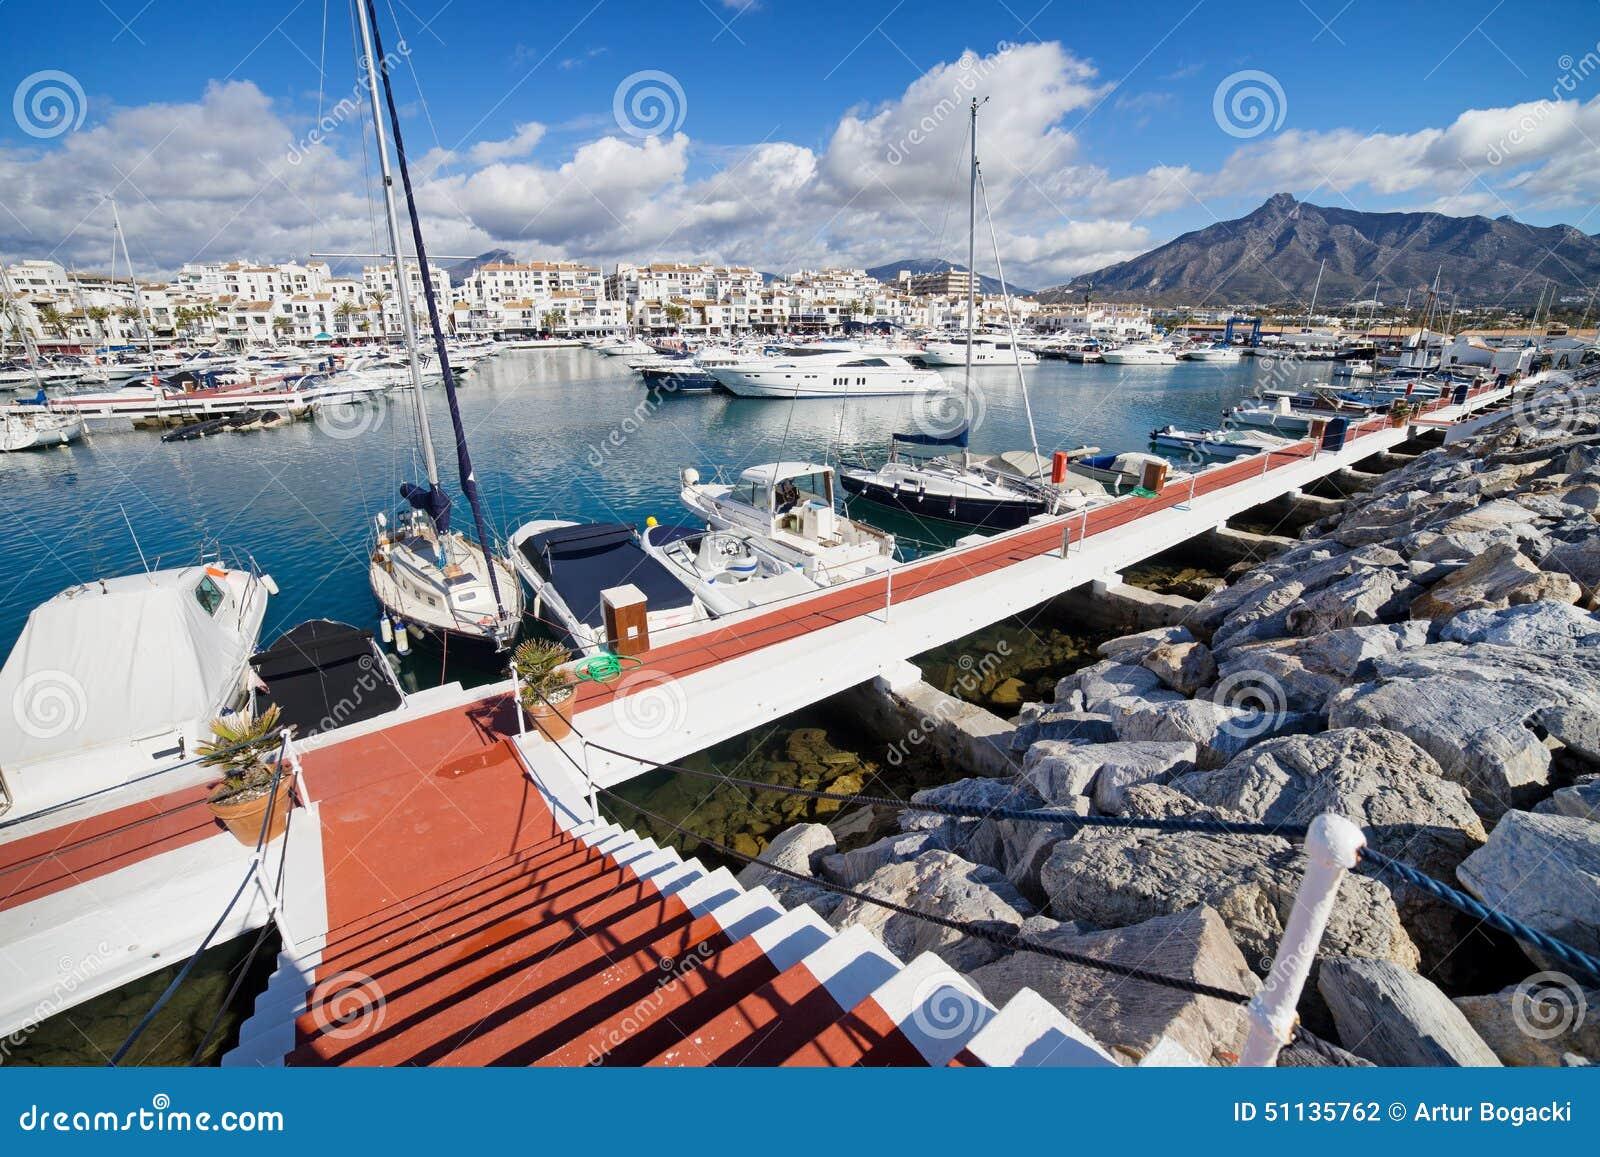 Puerto Banus Marina On Costa Del Sol In Spain Stock Photo